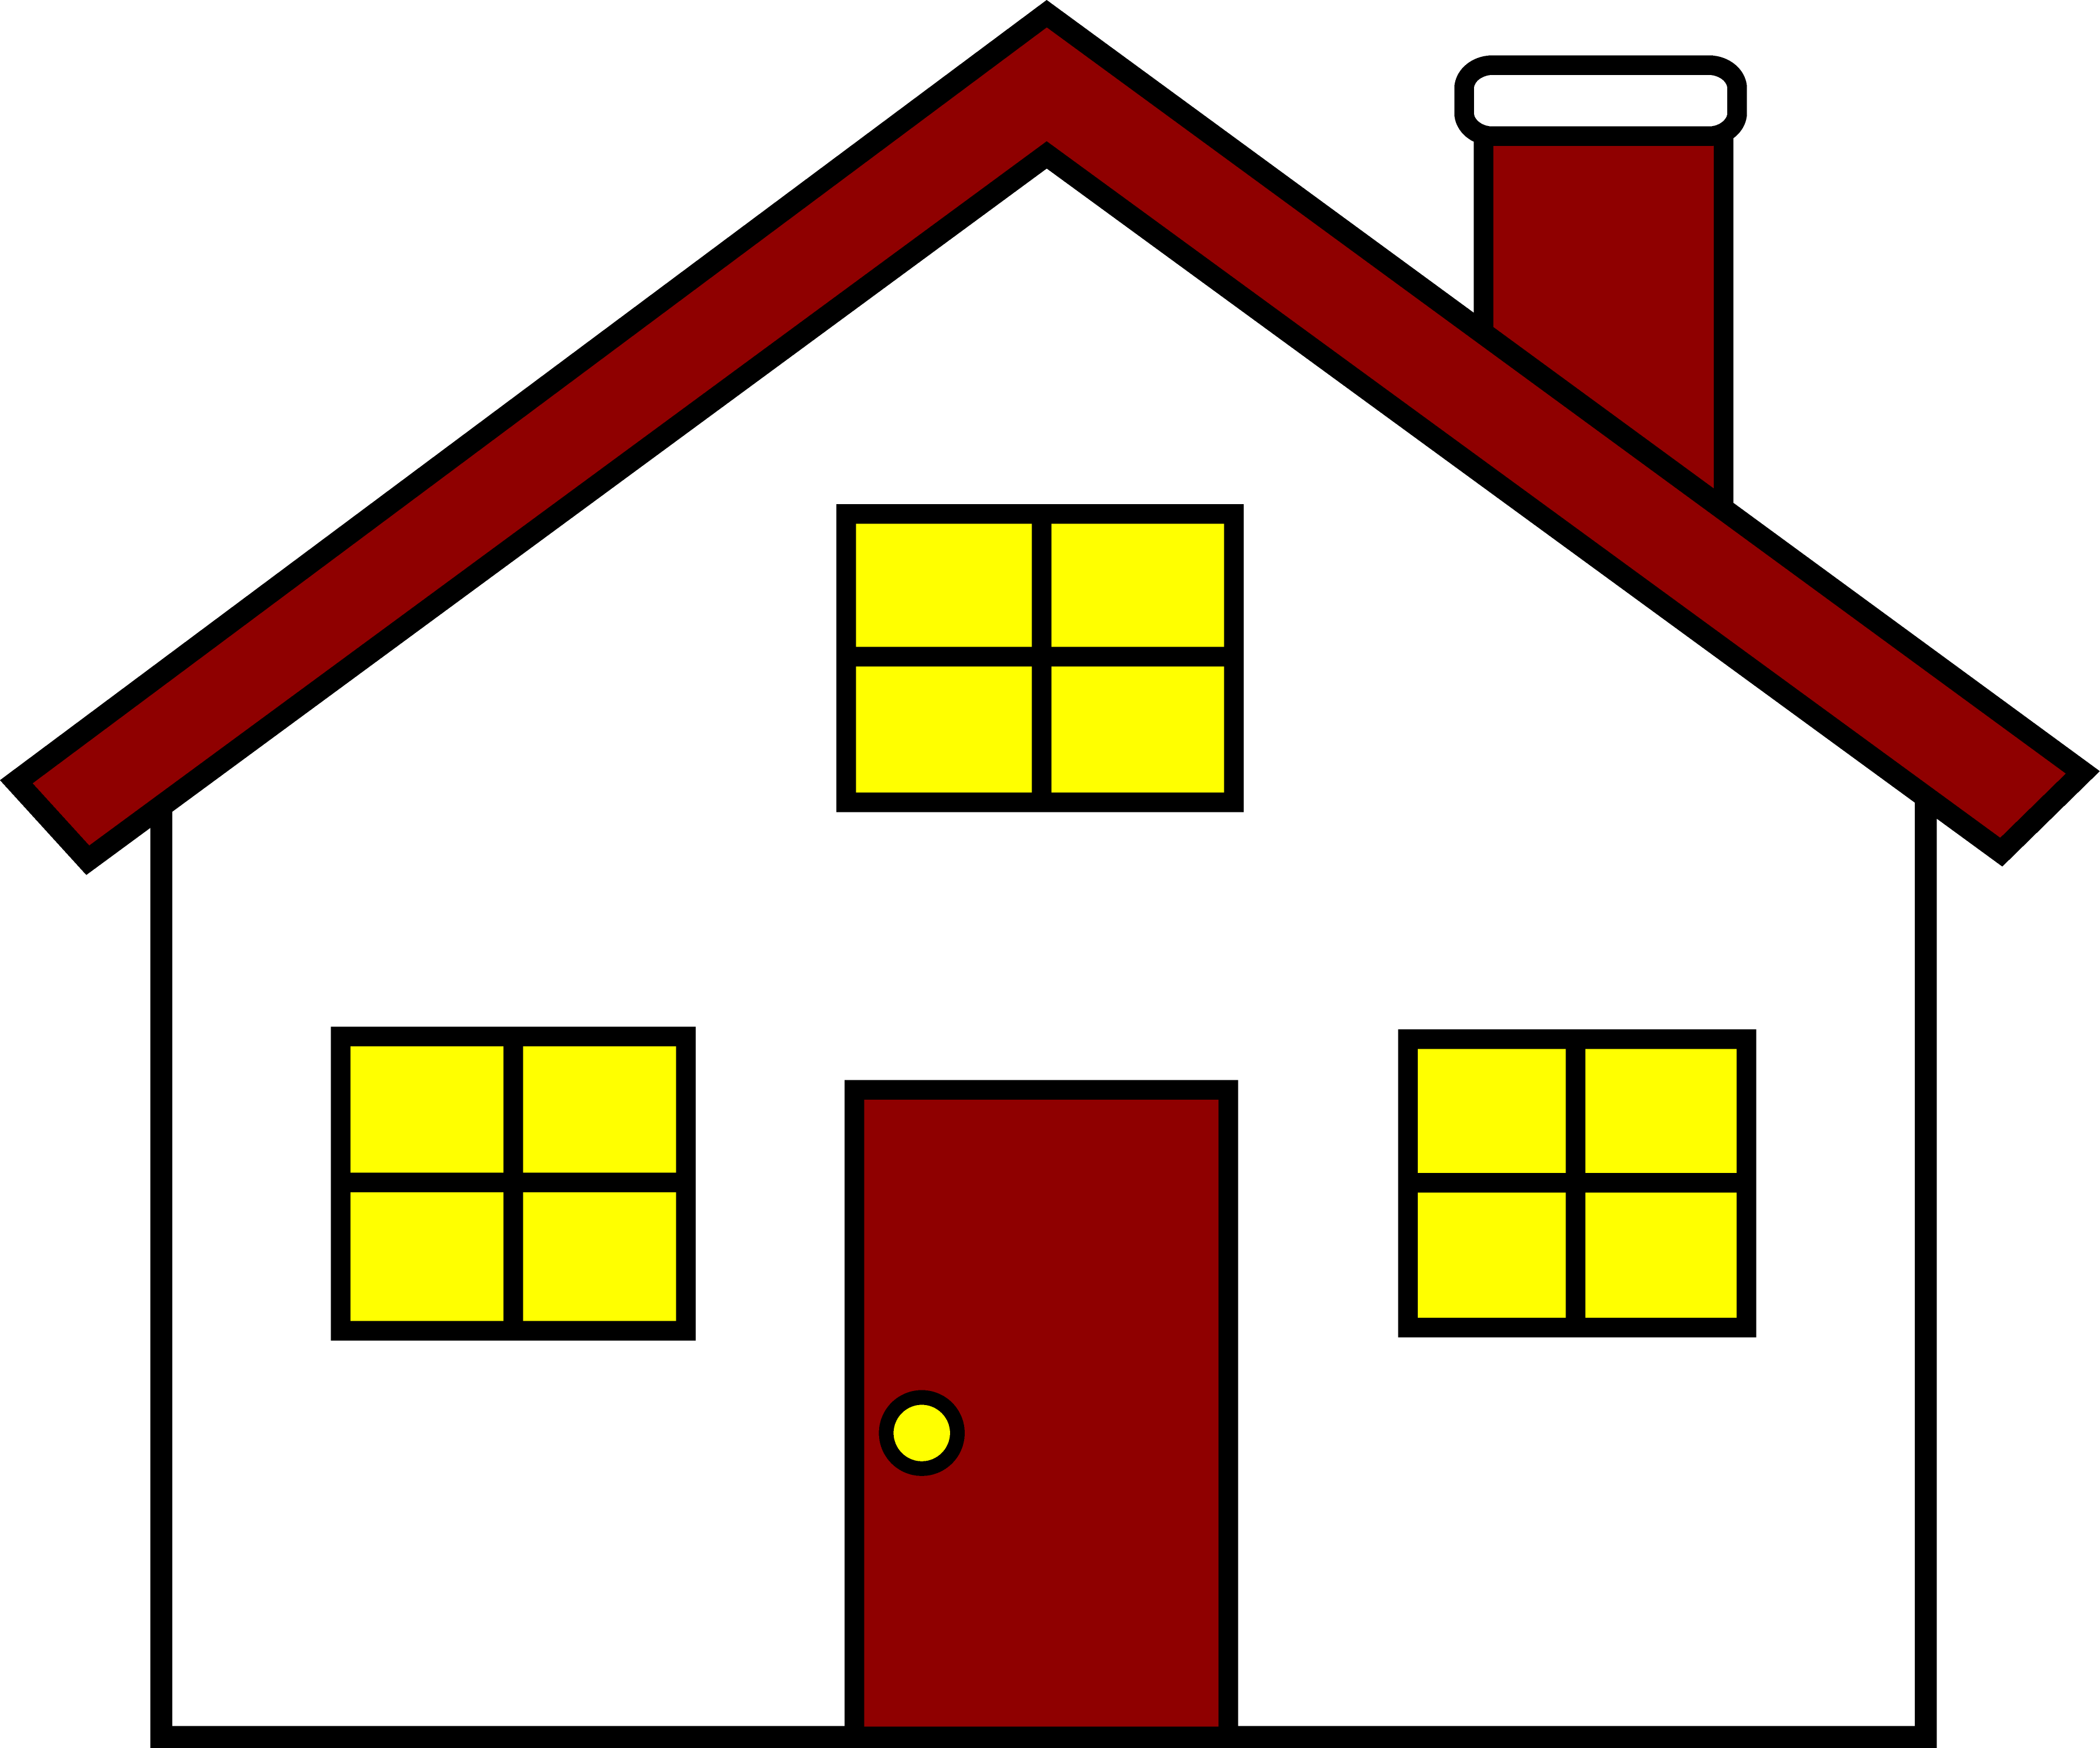 3583x2982 House Clip Art Free Cartoon Clipart Images